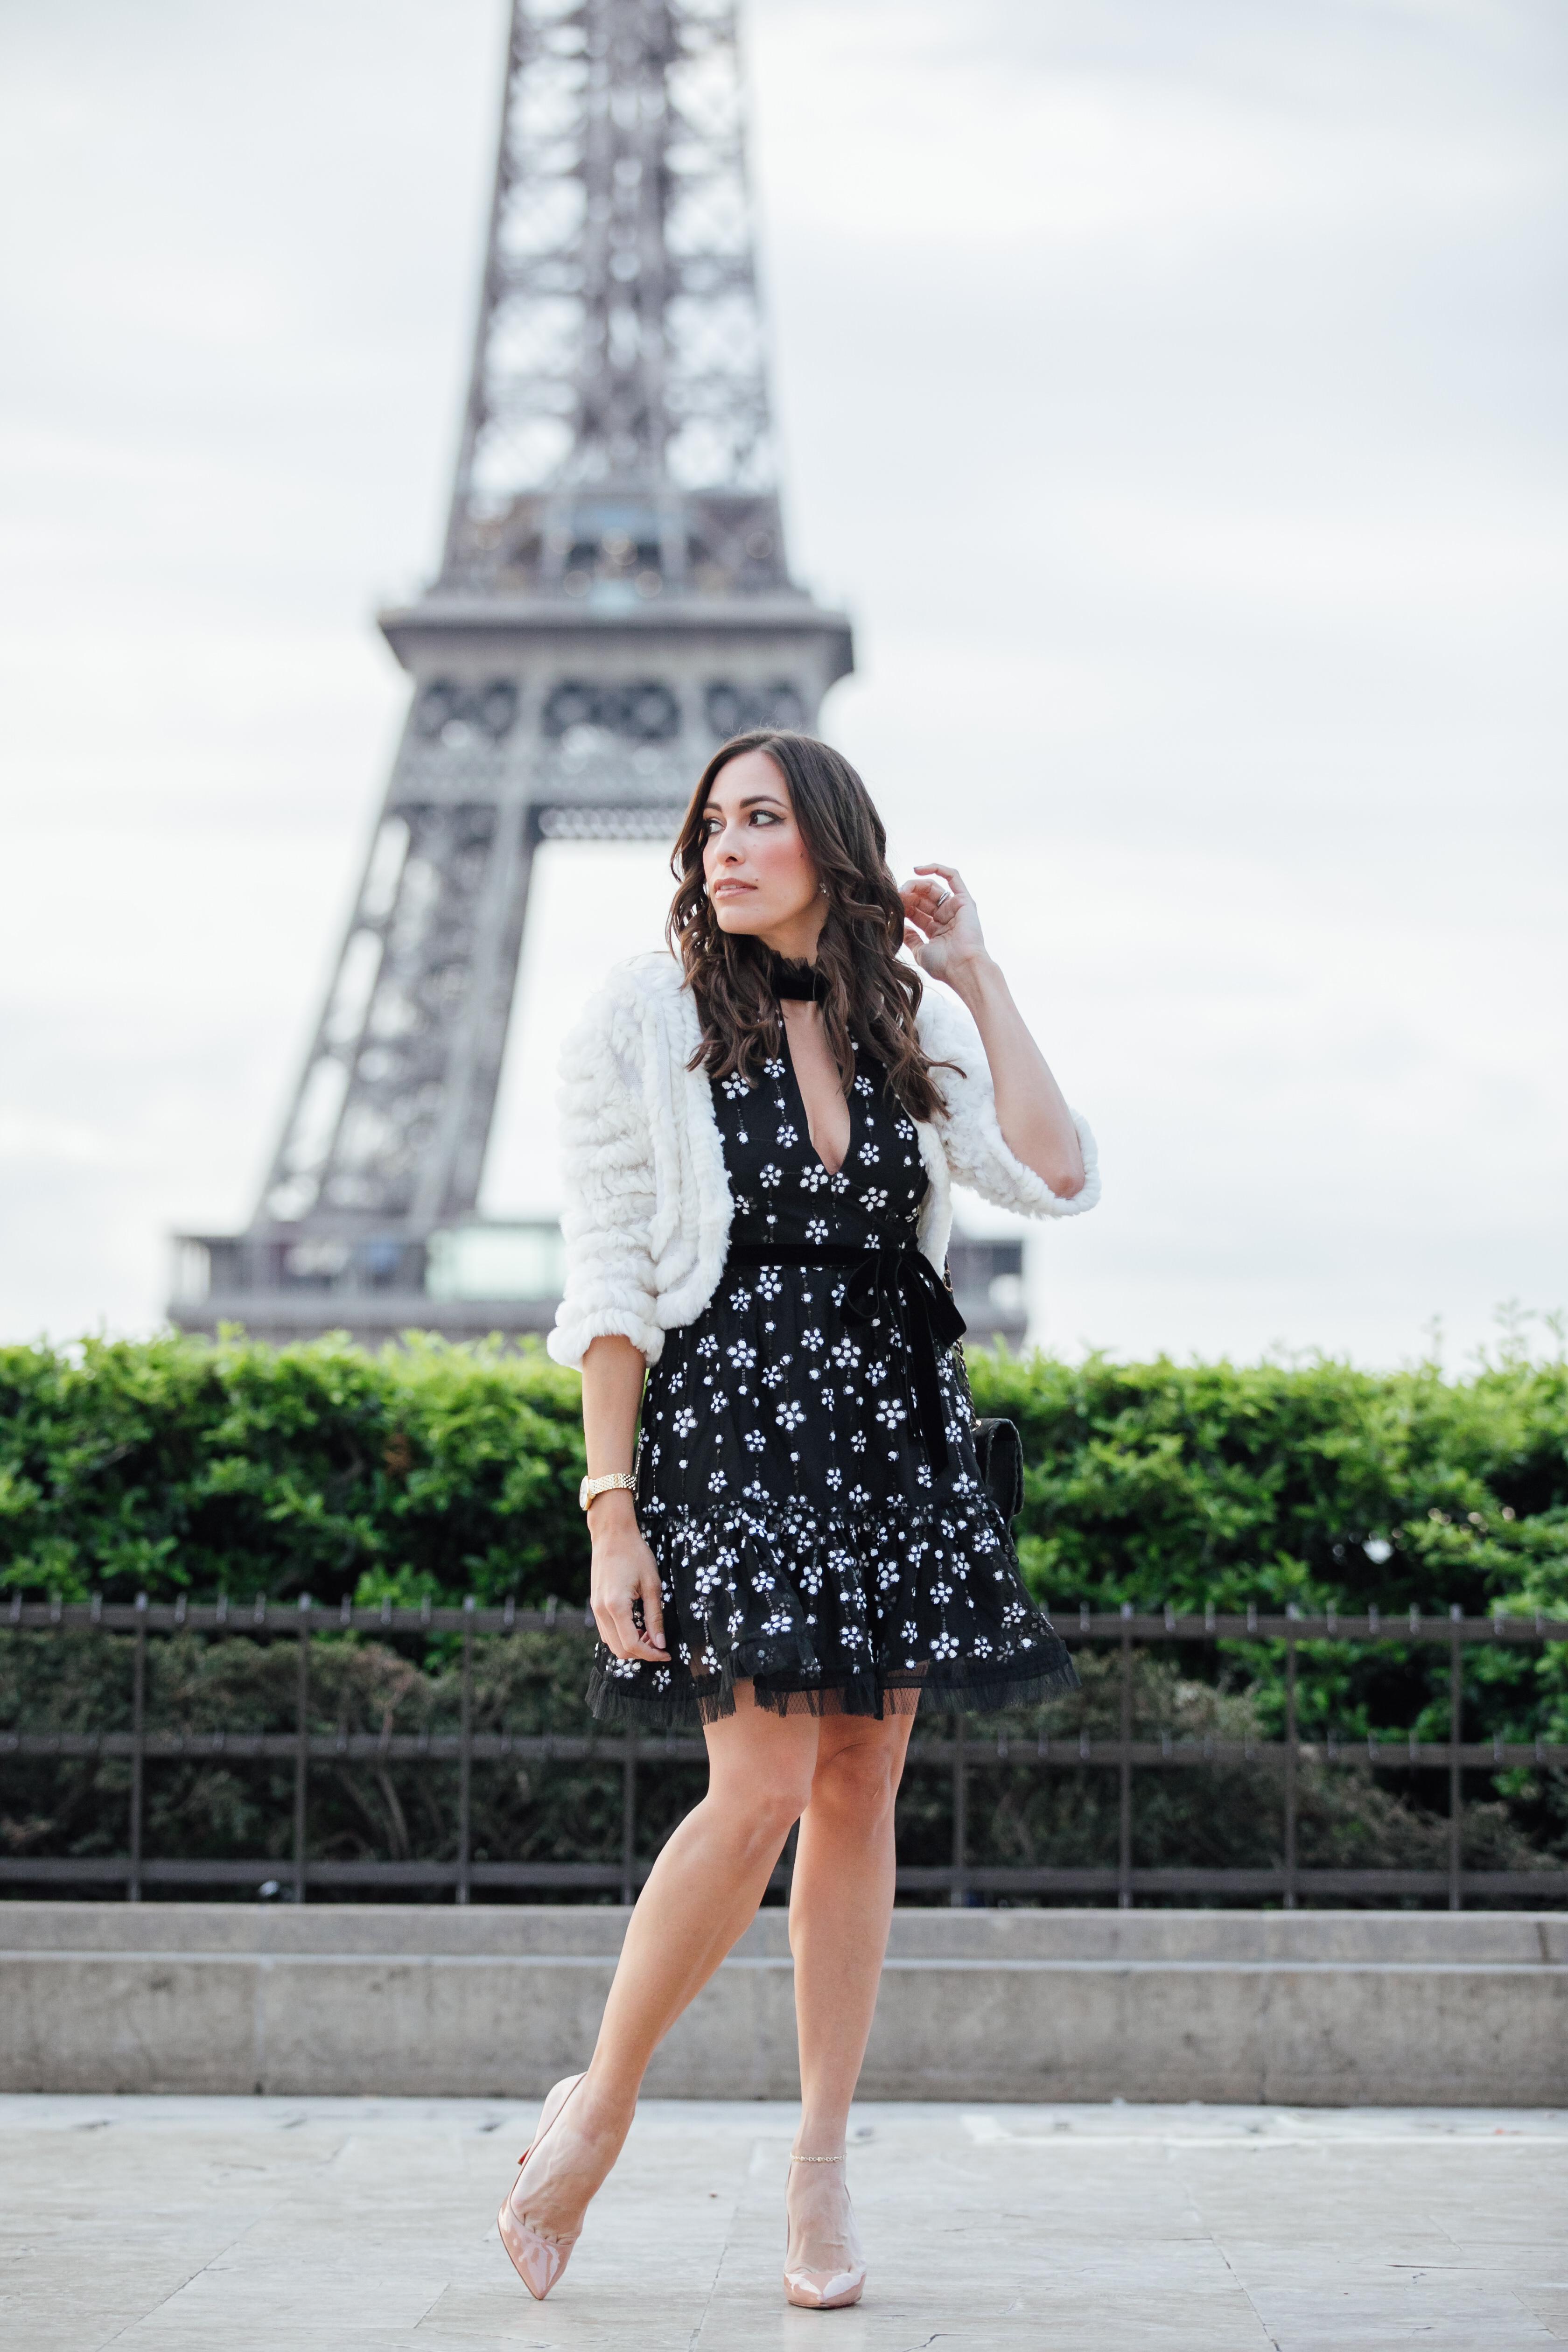 Alexis dresses shown by AGlamLifestyle blogger Amanda in Paris wearing Alexis Poppy dress with BCBG fur shrug